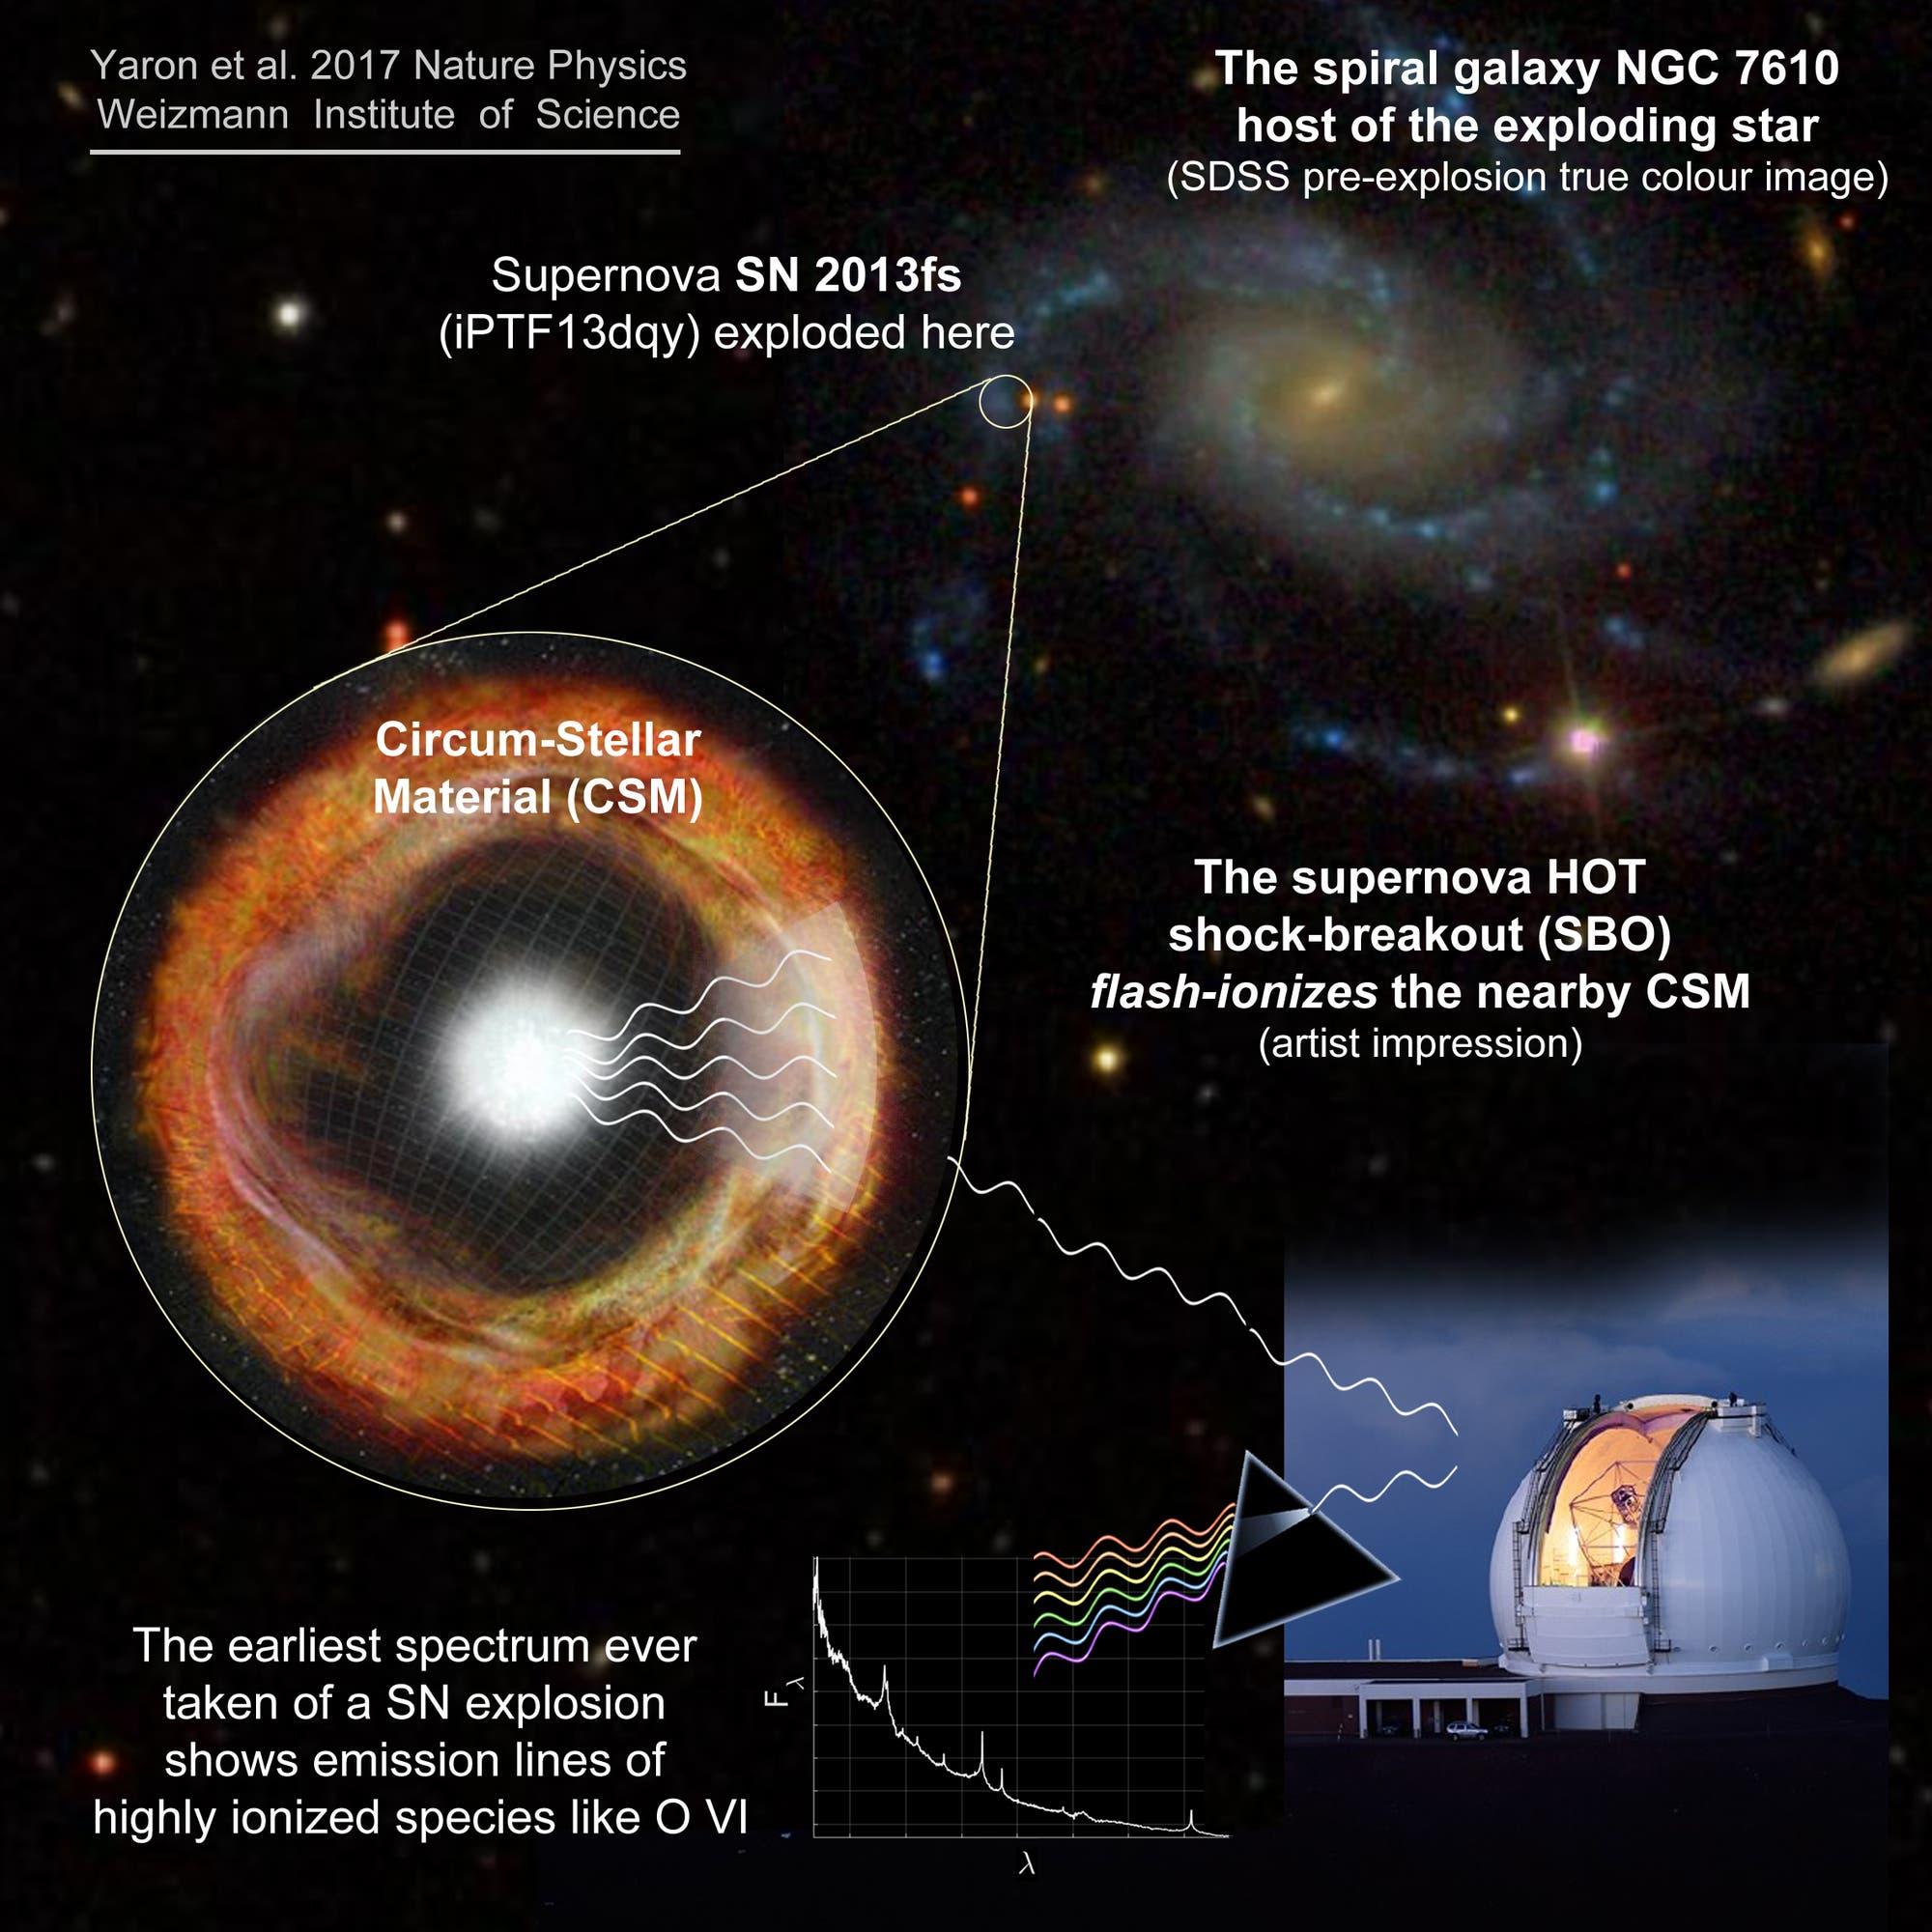 Die Supernova SN 2013fs in der Galaxie NGC 7610